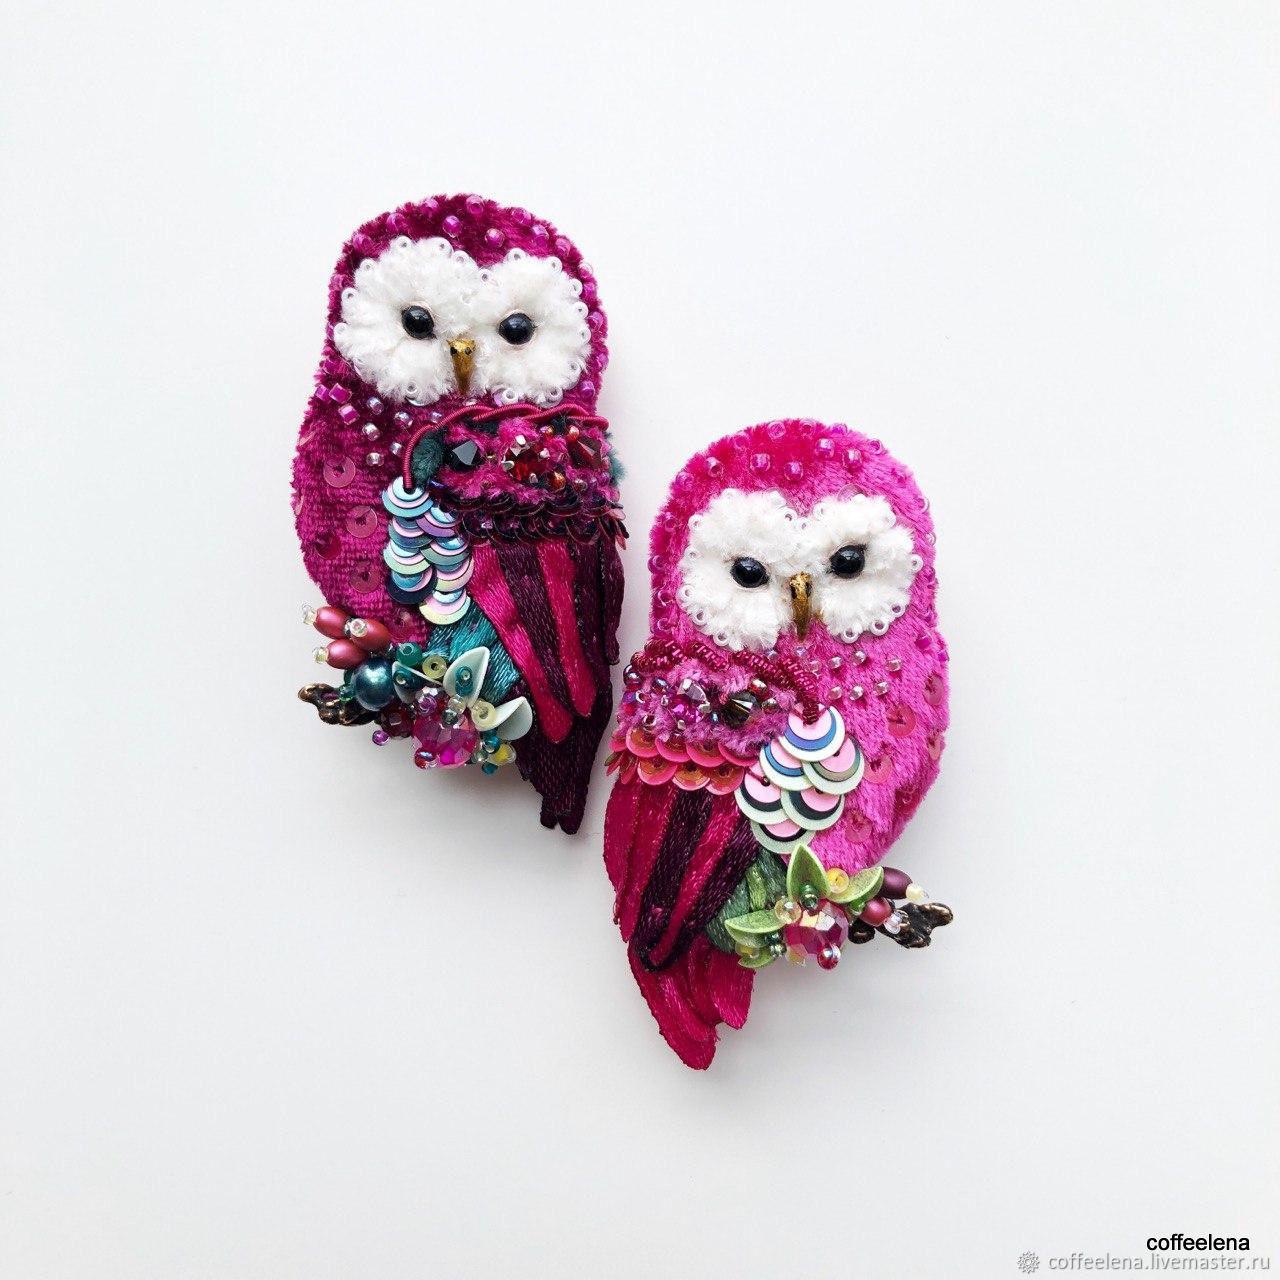 Brooches 'Peony Owls' brooch bird, Brooches, Krasnodar,  Фото №1